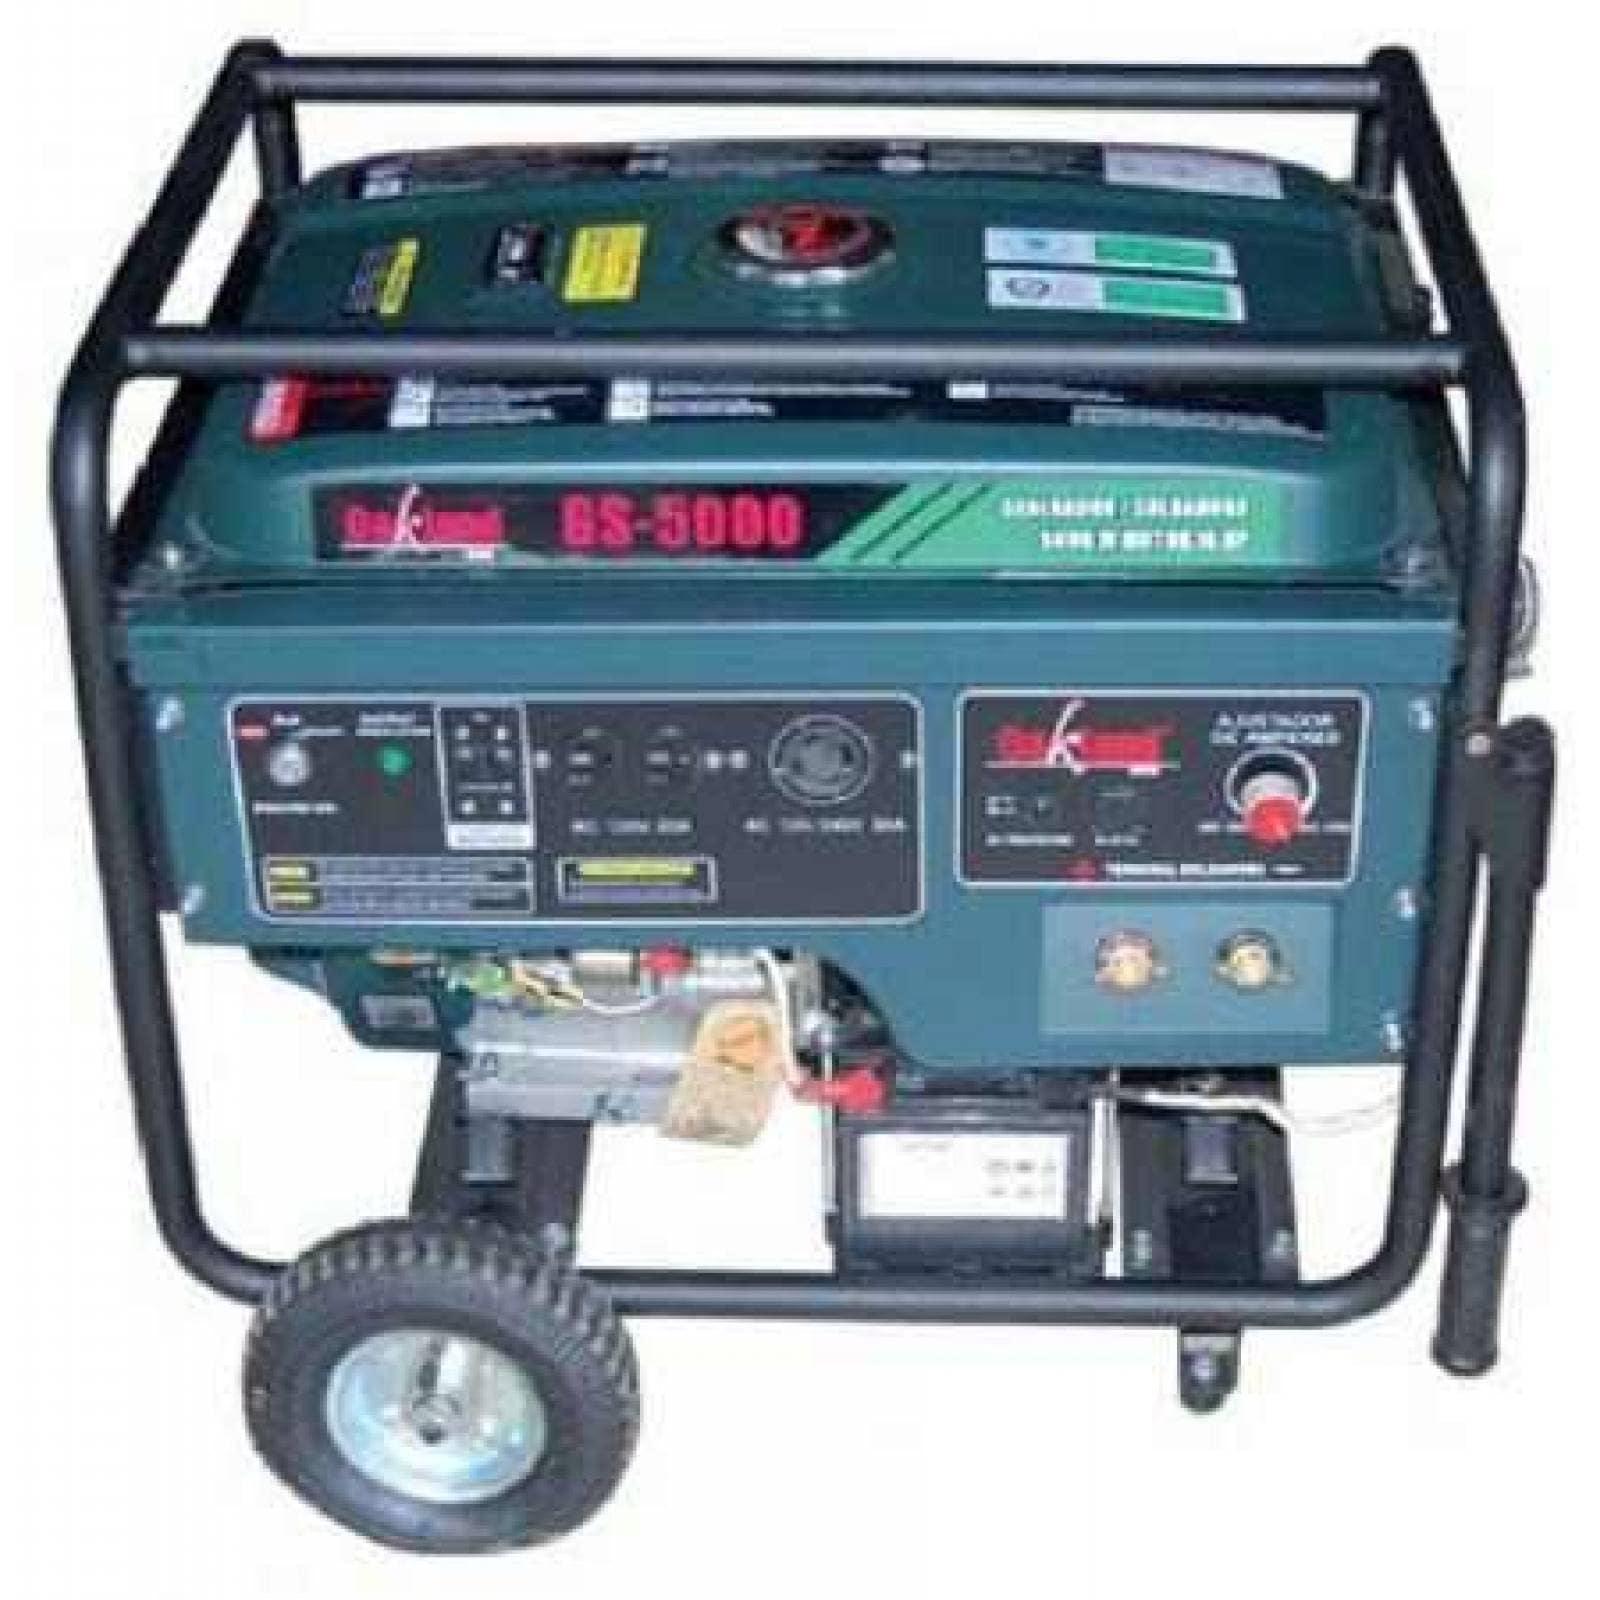 Generador Soldadora Oakland 5000w Gs5000 High Power